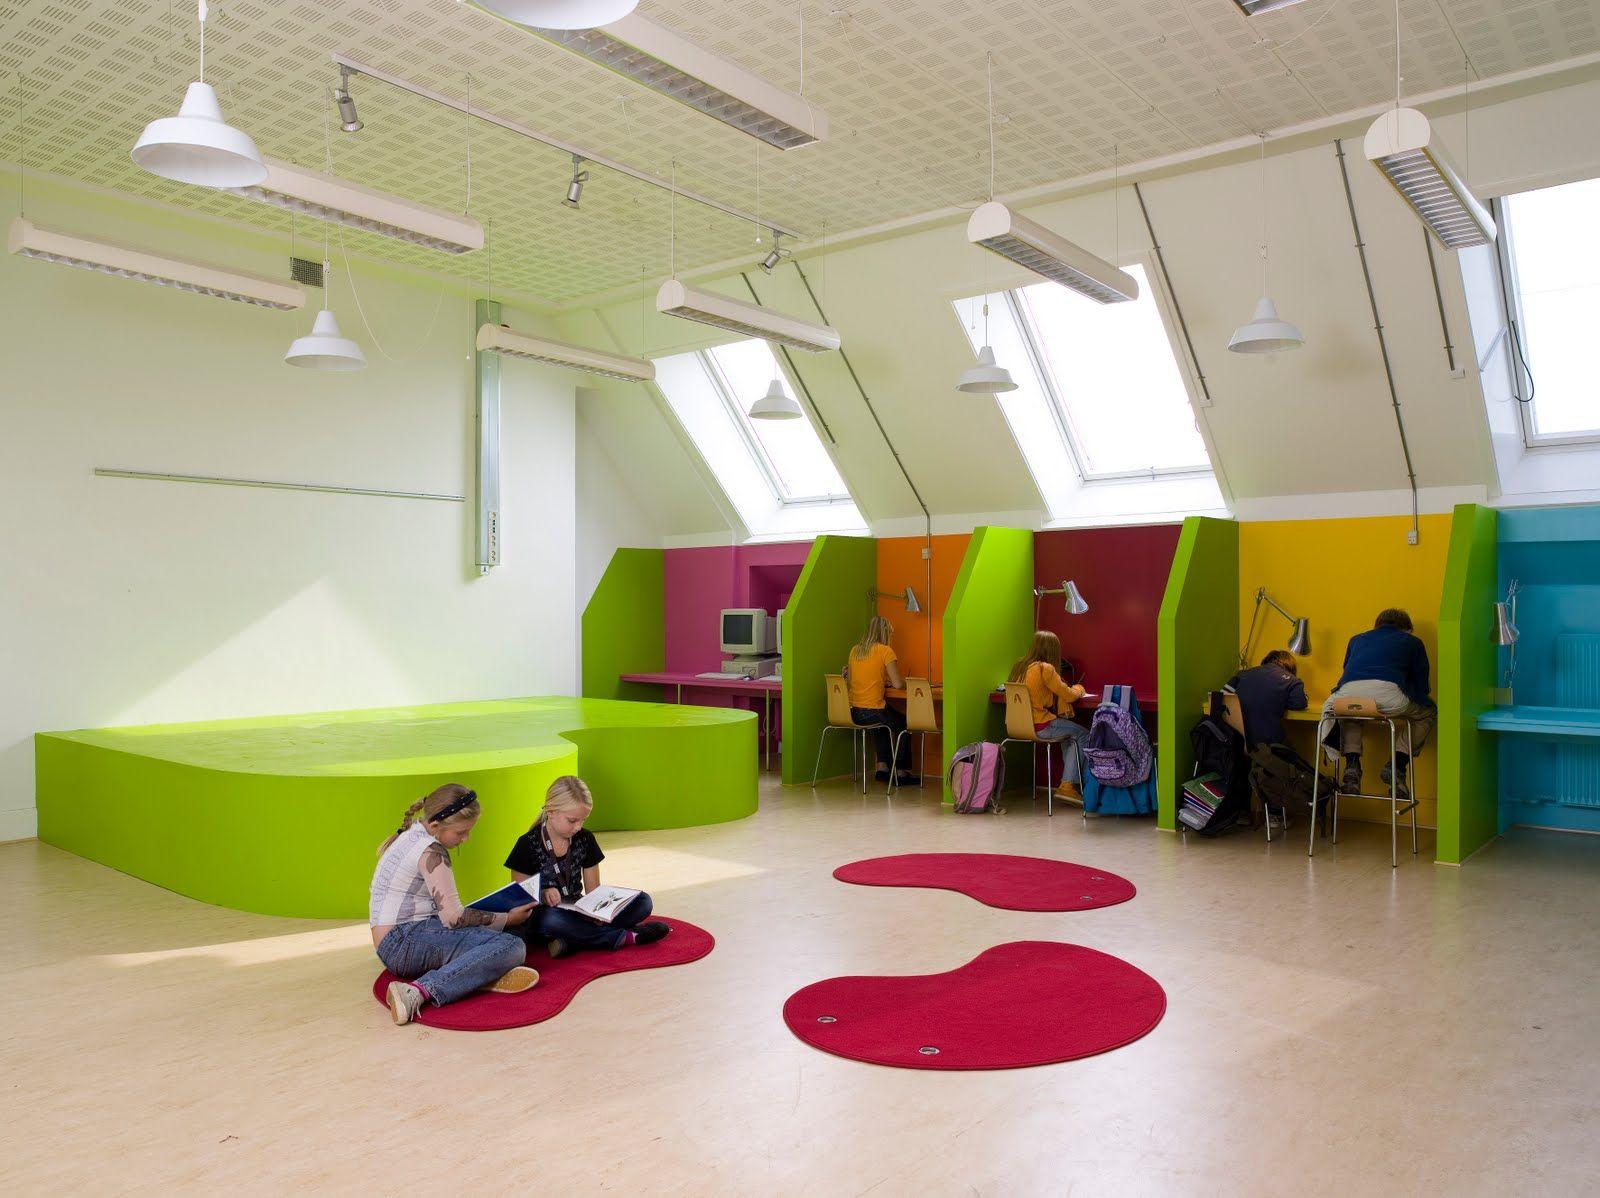 escuela ordrup / ordrup school - archkids. arquitectura para niños